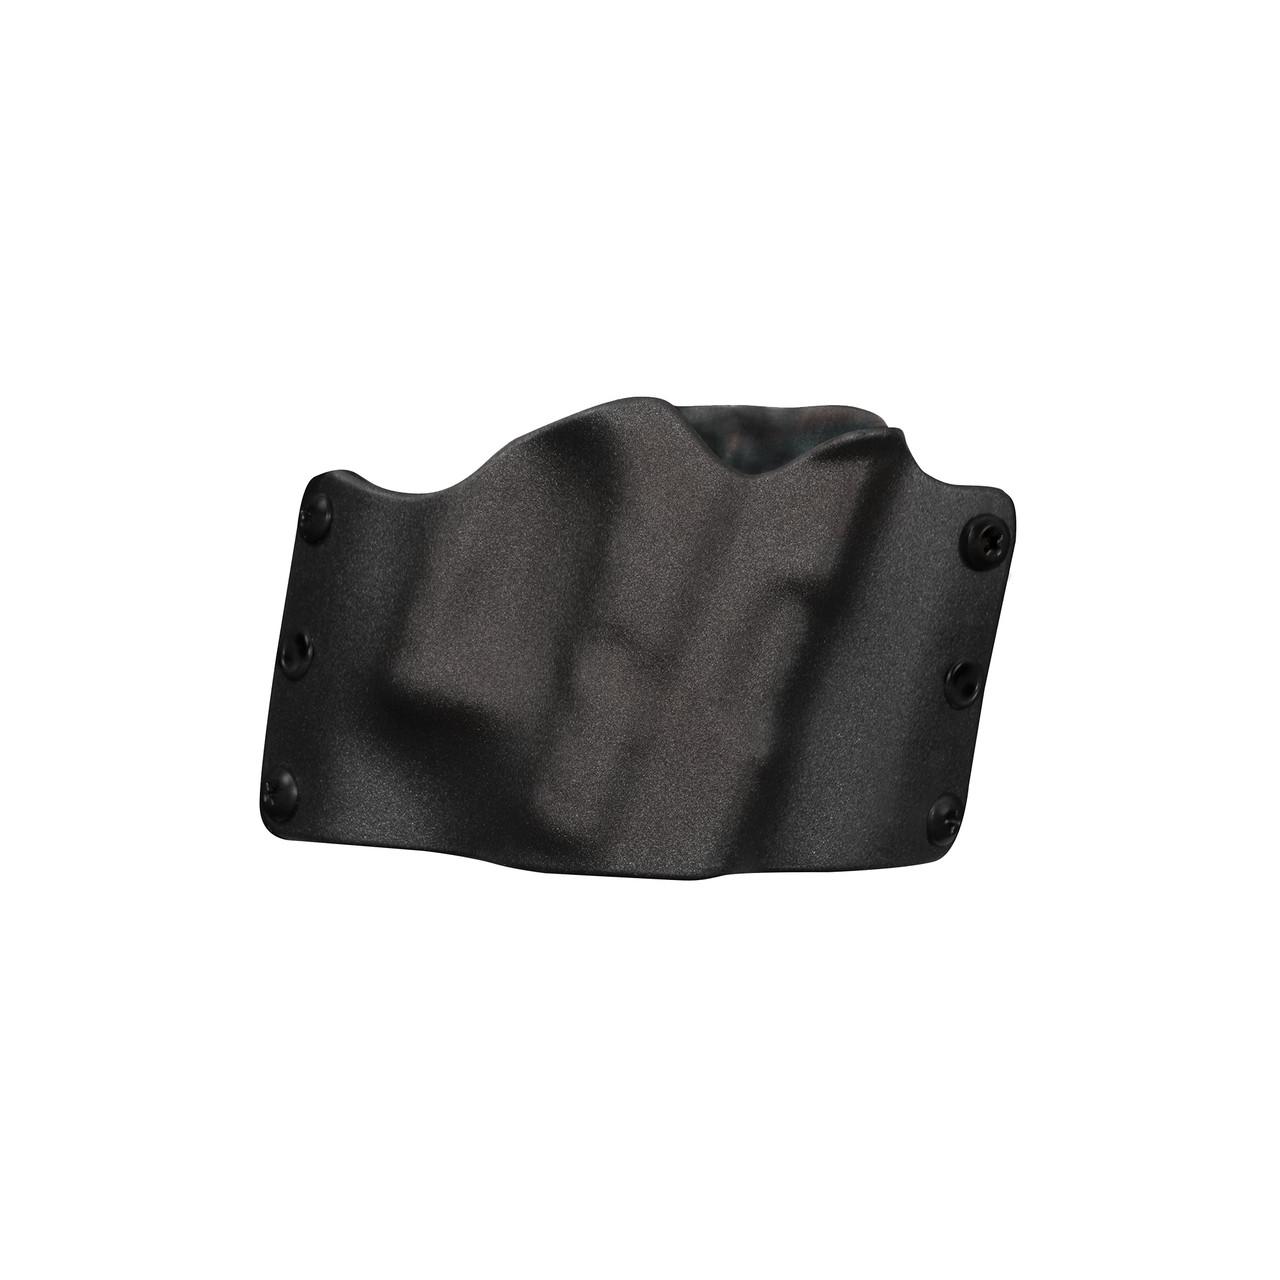 Stealth Operator Holster Compact Model, Open Bottom Muzzle, Fits Glock  17/19/20/26/30/34/40/41/43, HK P30/VP9, Ruger SR Series, 1911 Commander,  Sig